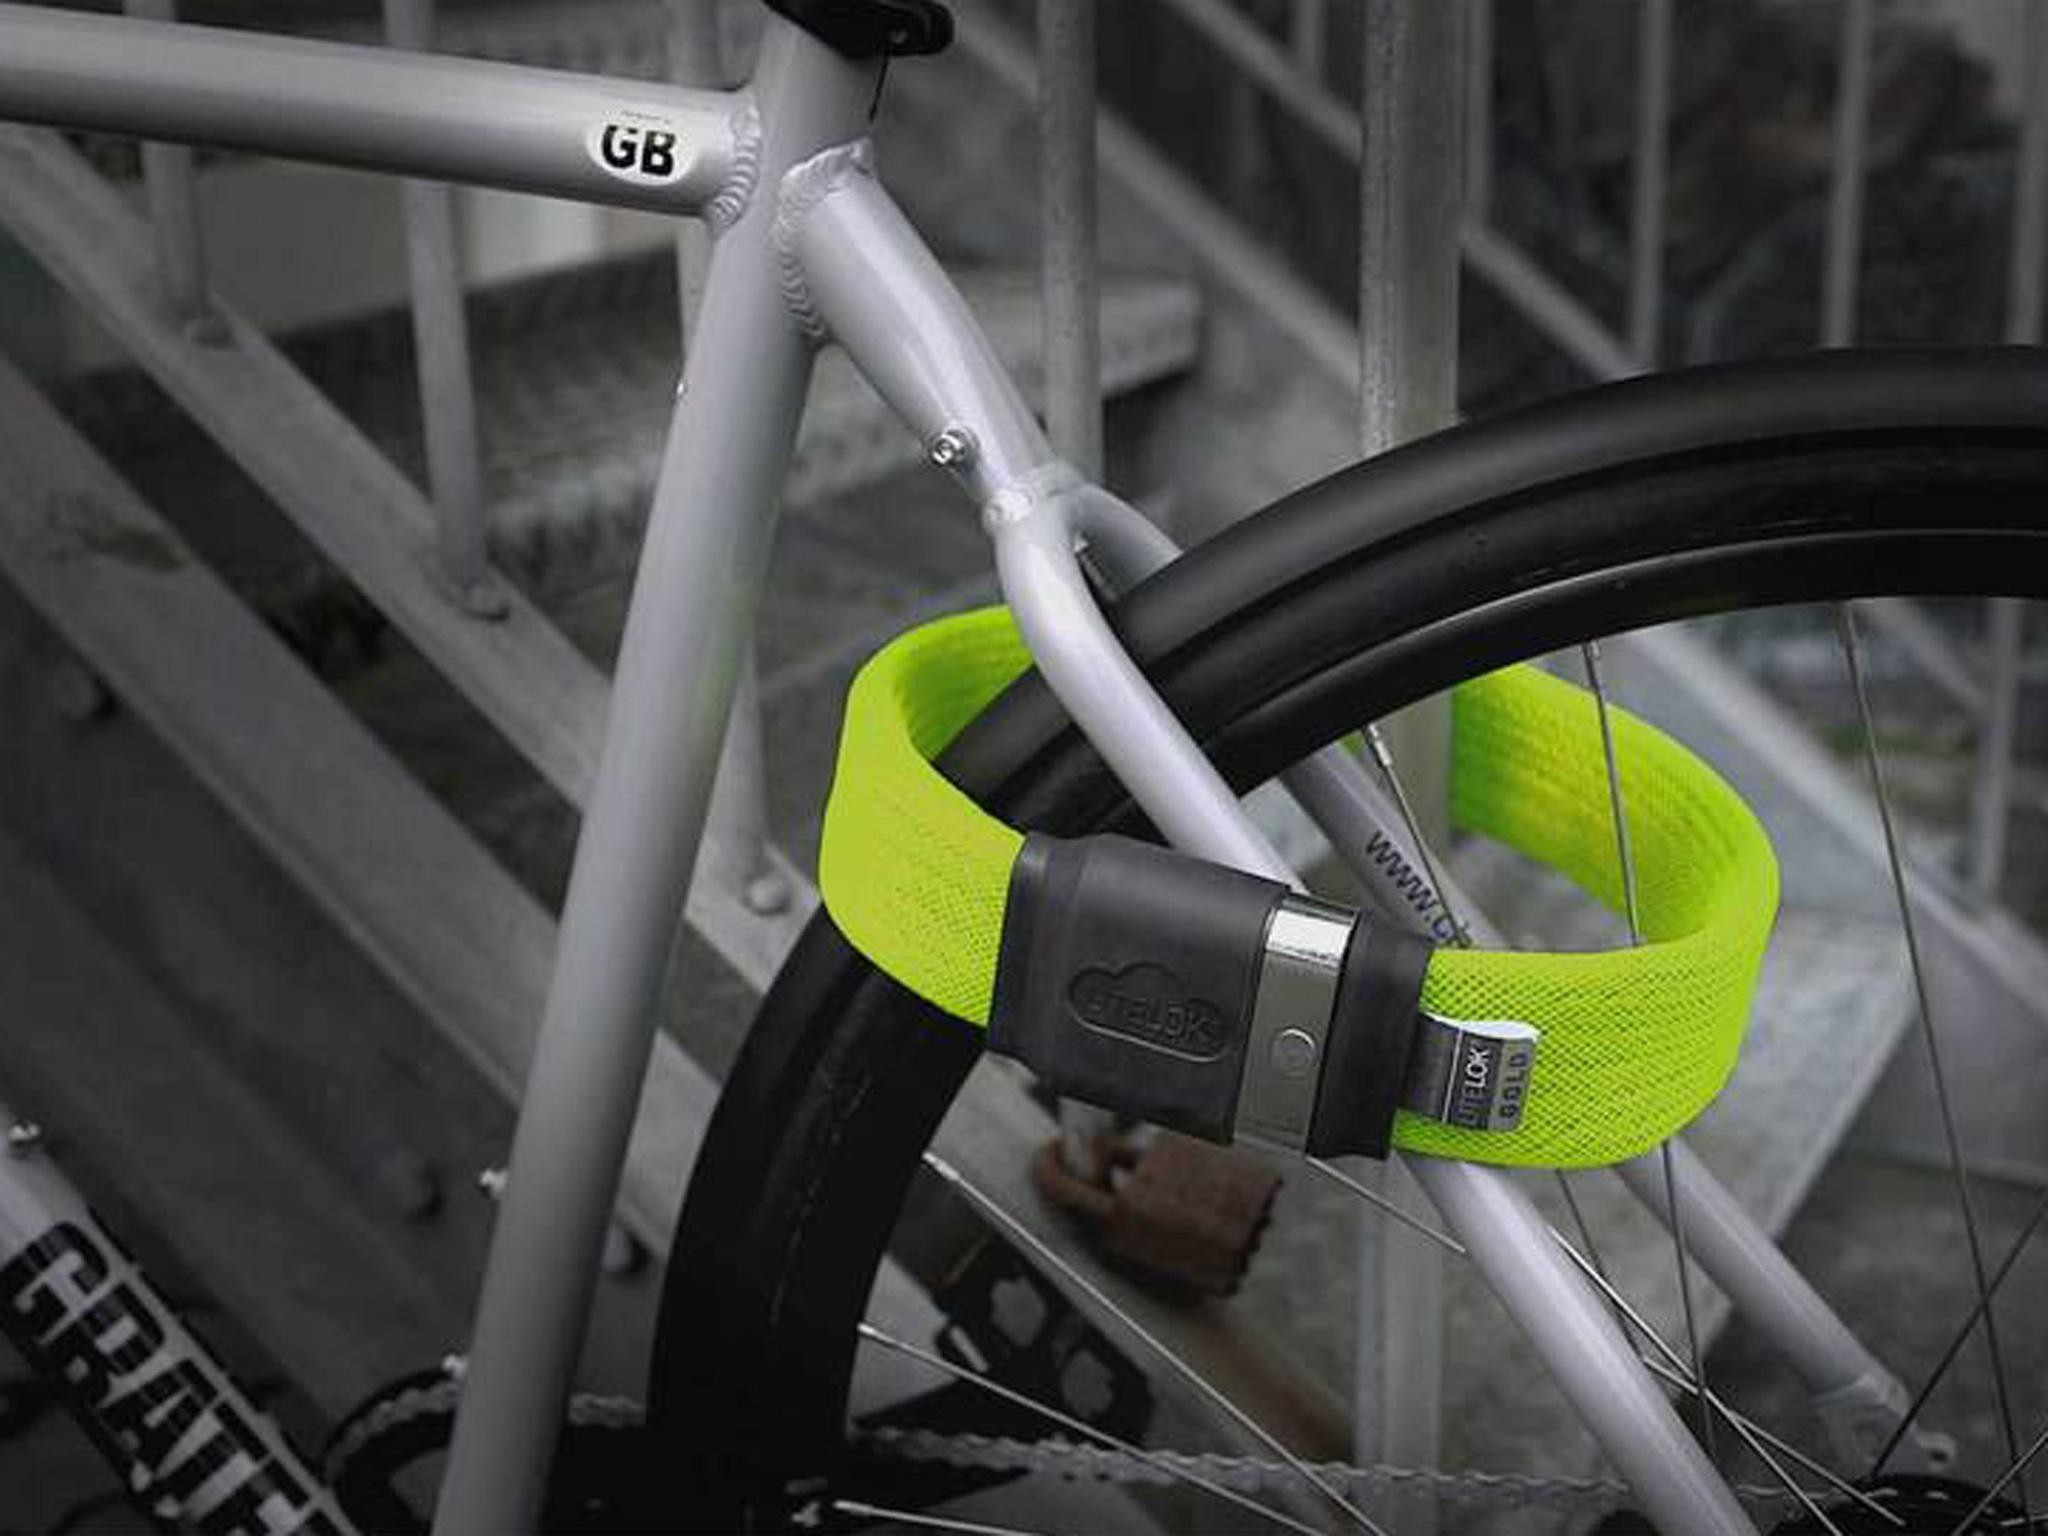 12 Best Bike Locks The Independent Security Zipper Lock Portable Mini Padlock For Bags